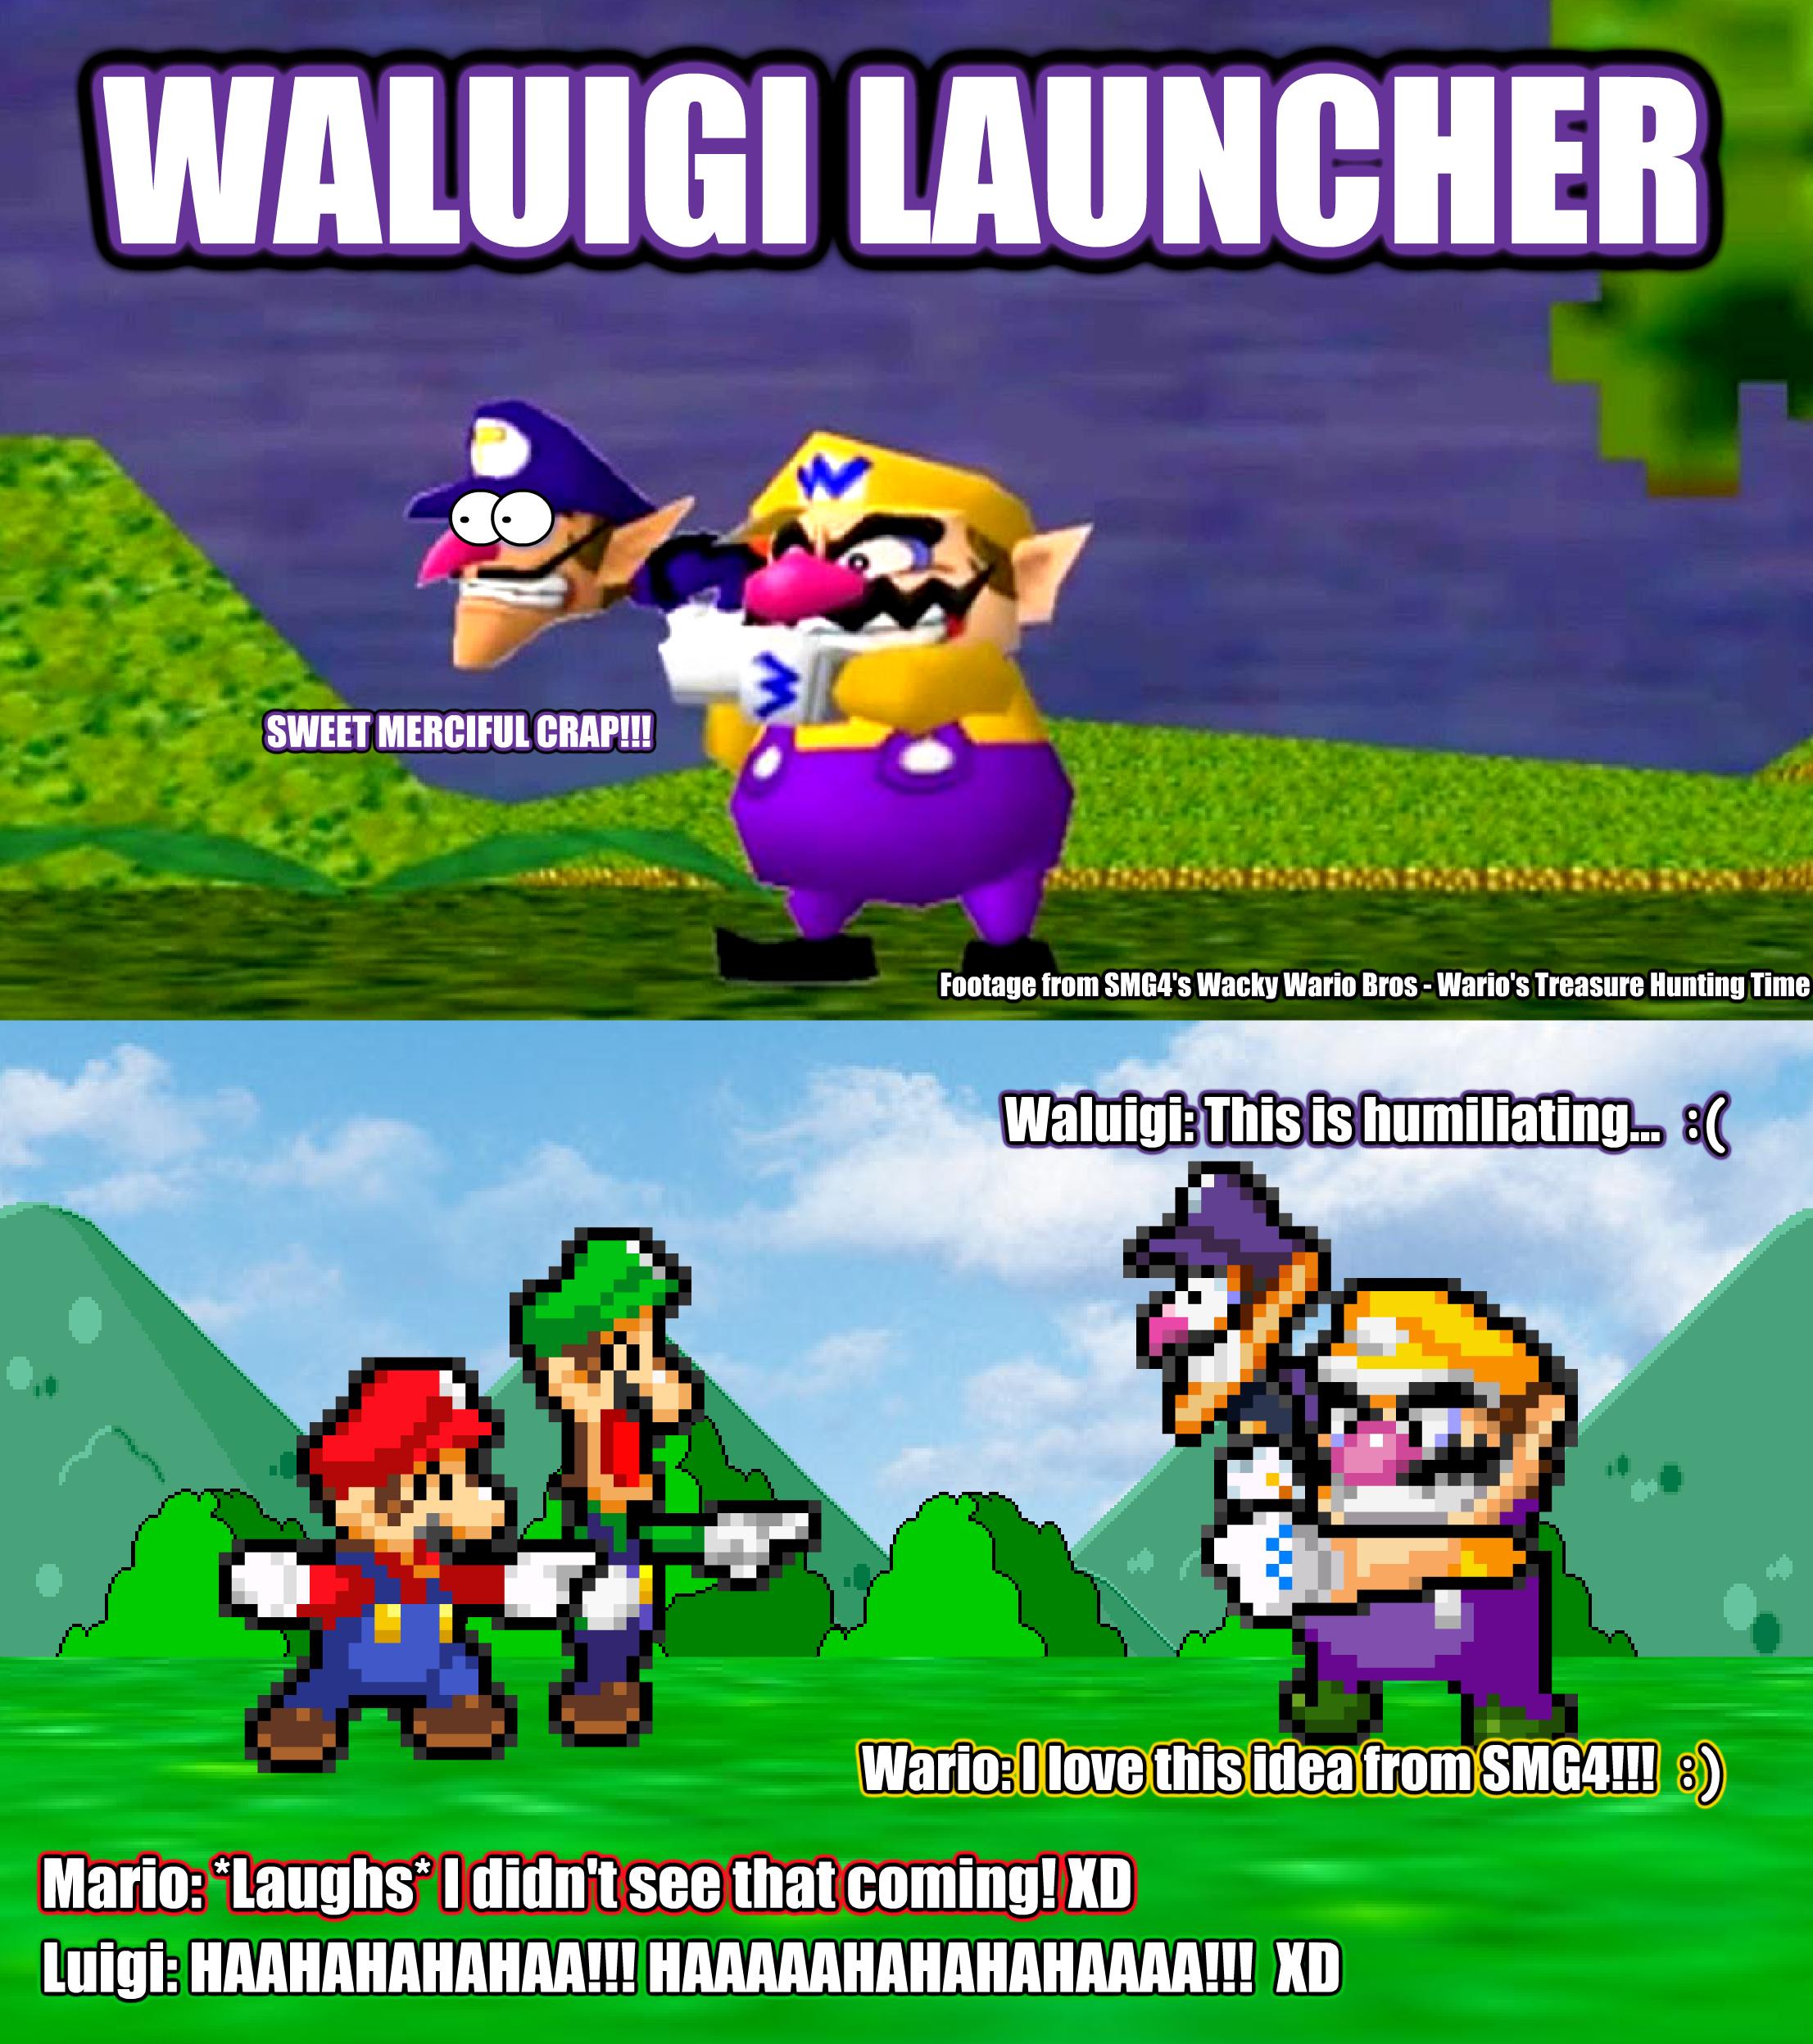 SMBHotS Mario Bros Reaction Of Waluigi Launcher By